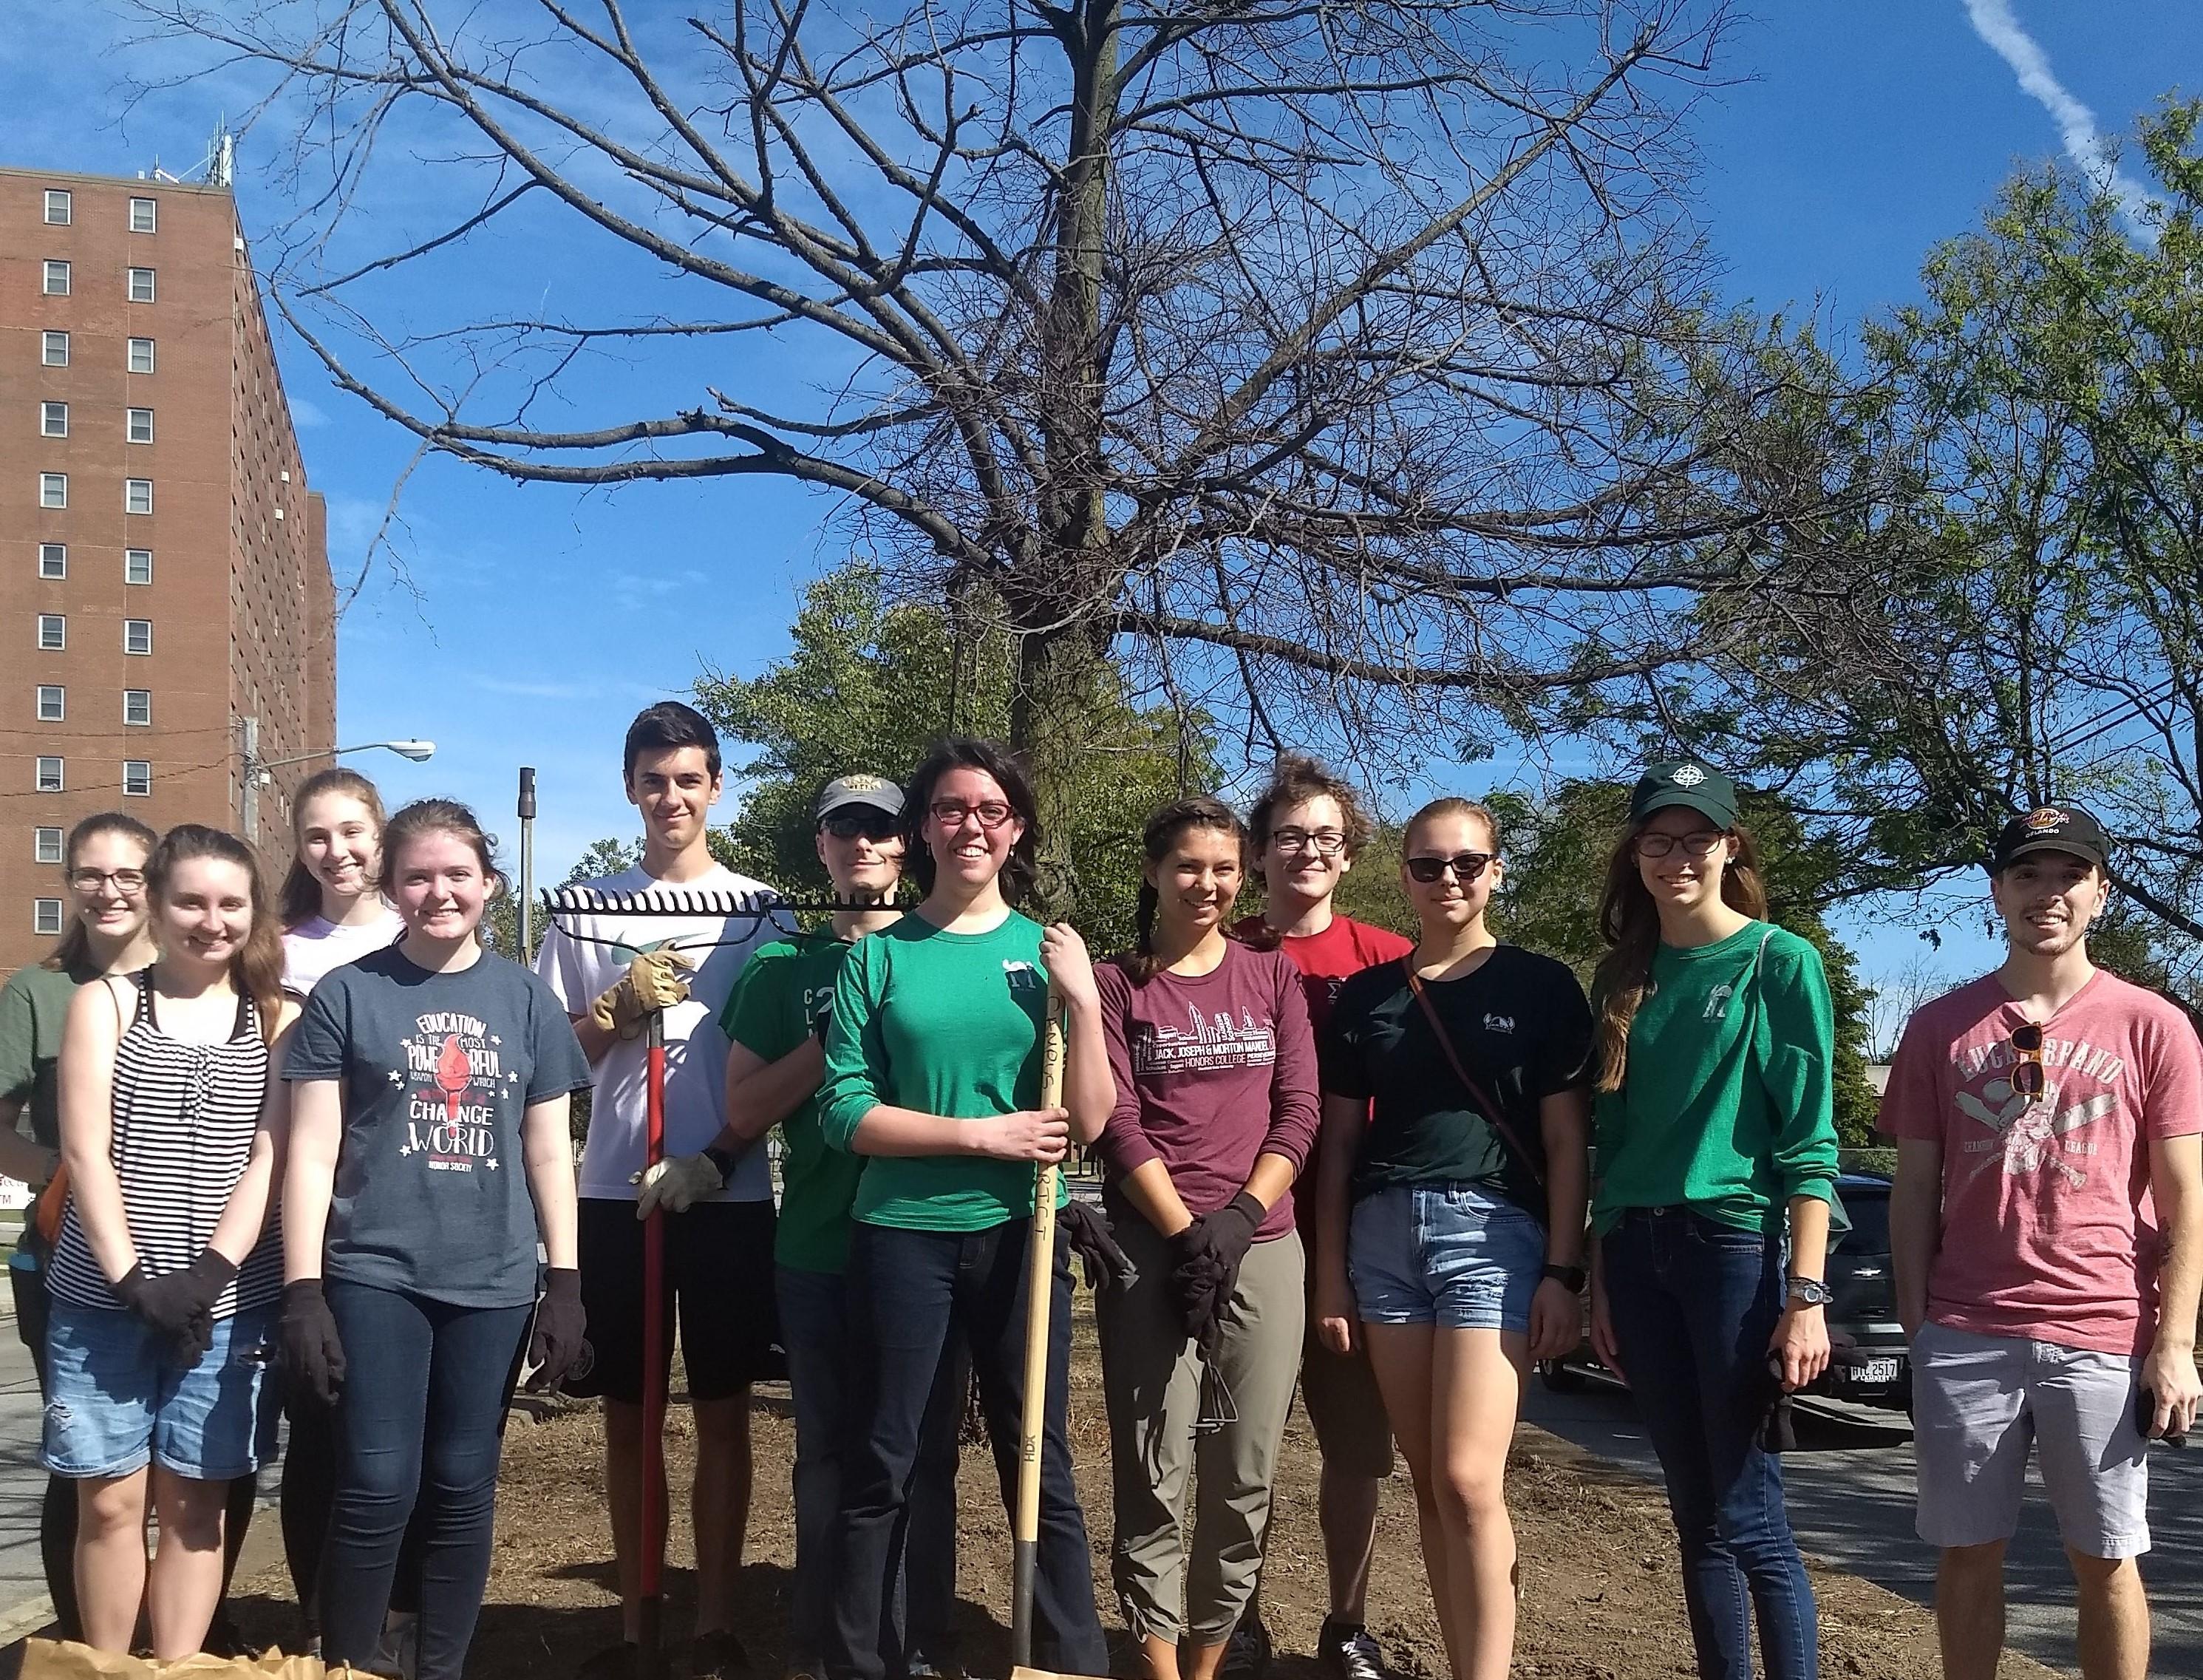 Mandel Vikes students cdoing community service